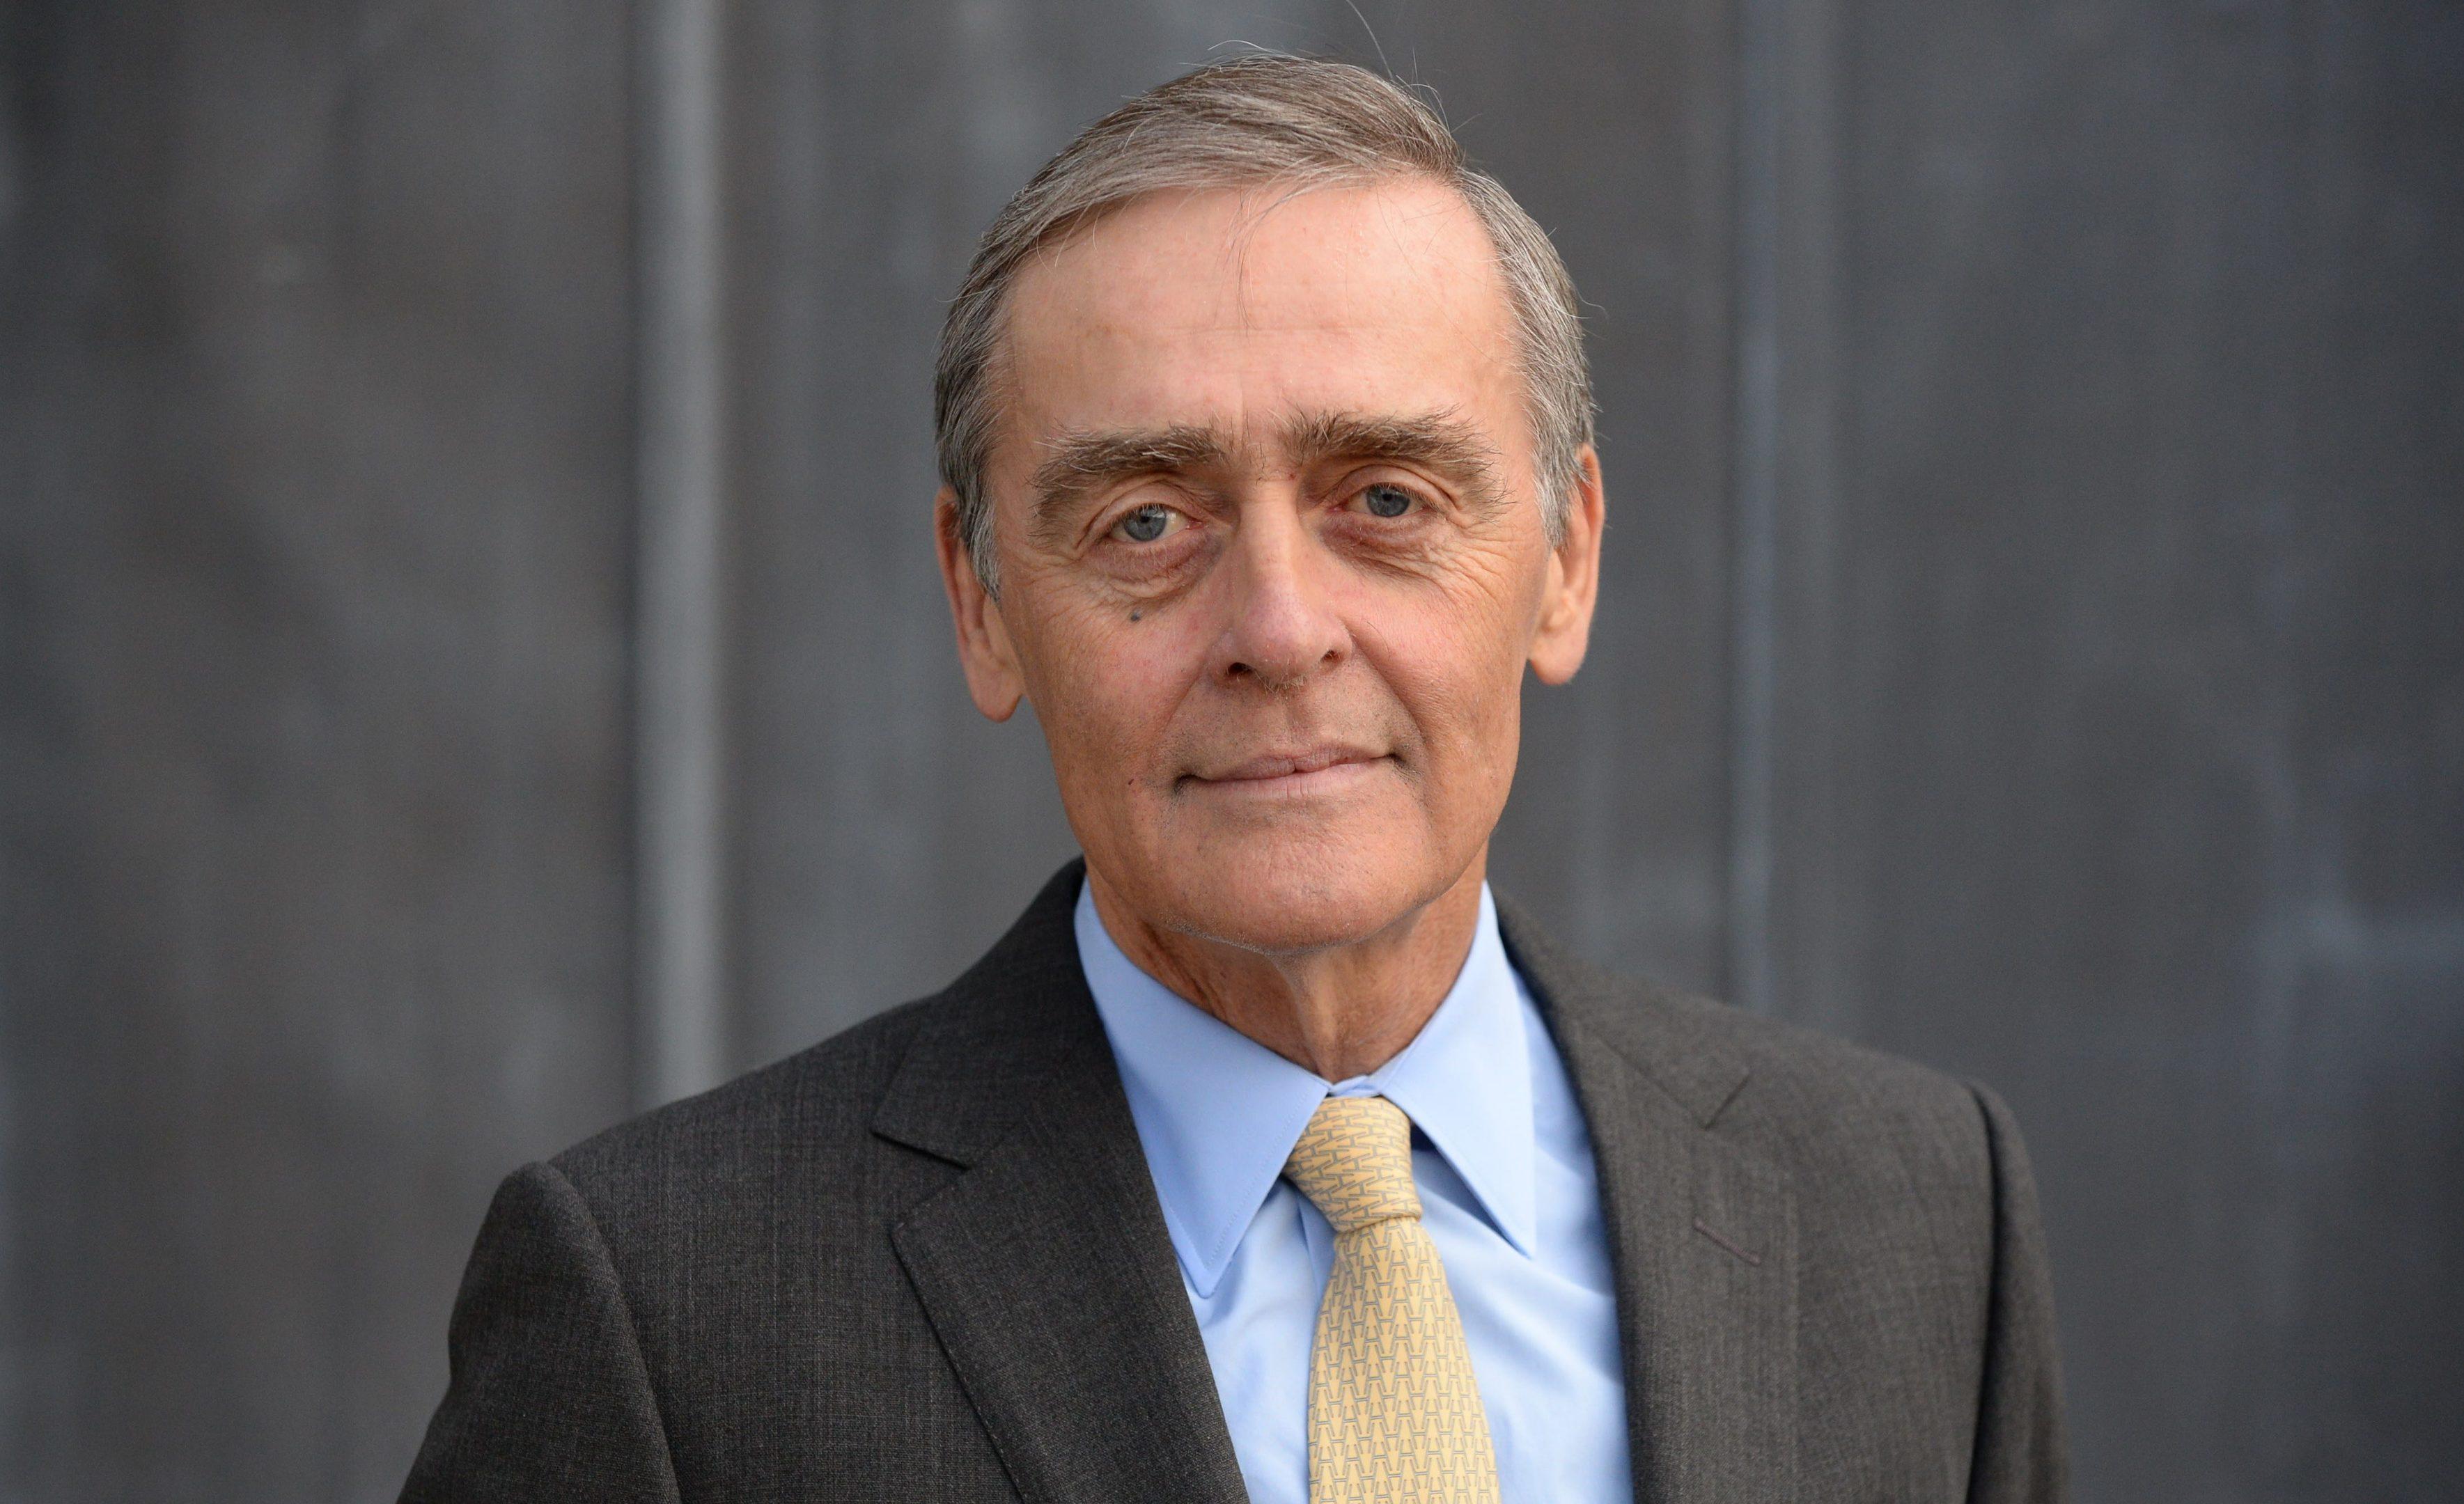 The late Duke of Westminster, Gerald Cavendish Grosvenor.